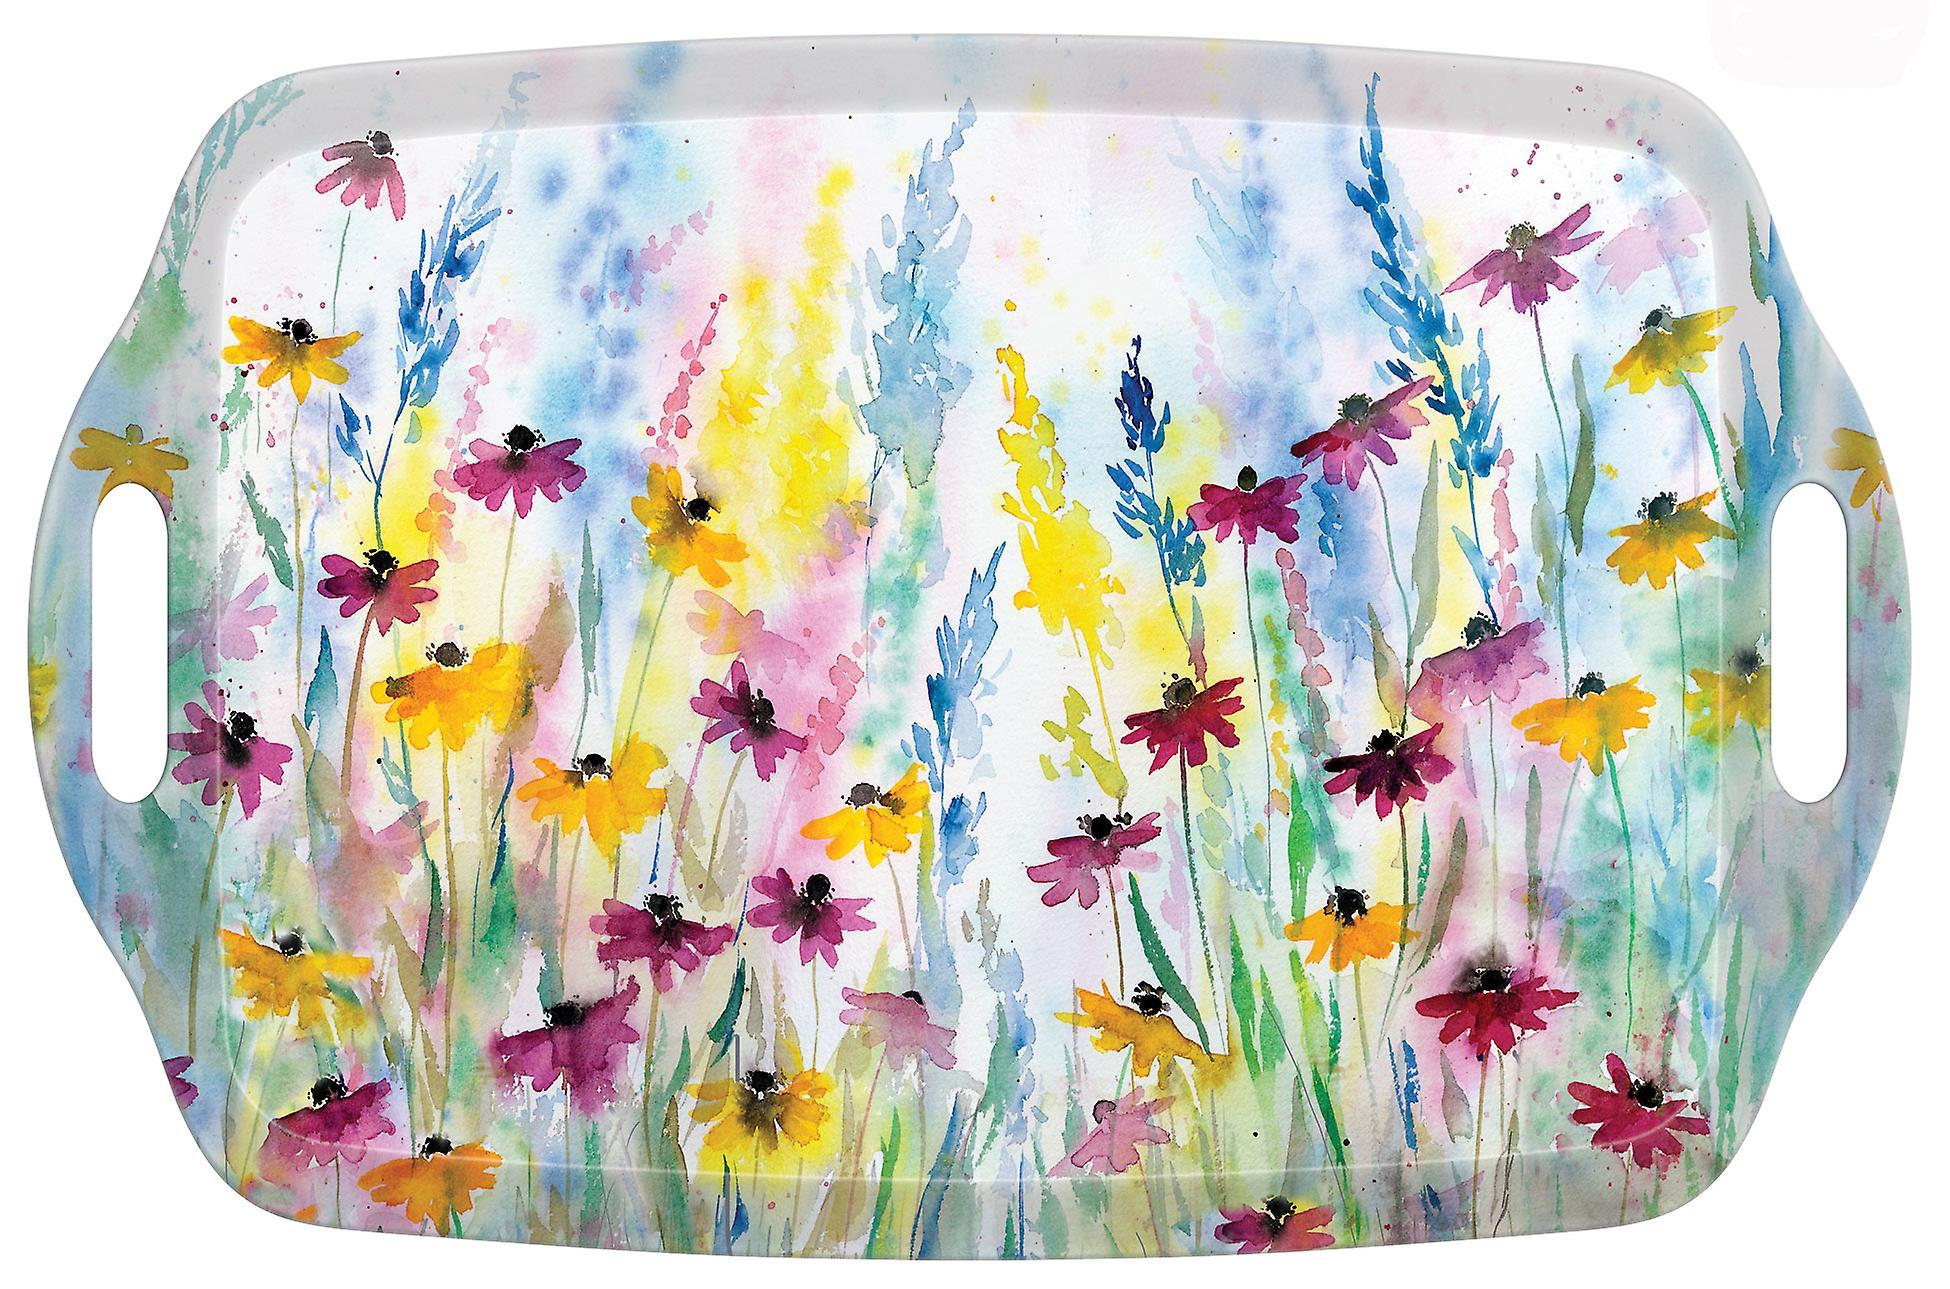 I Style Daisy Field Large Tea Tray with Handles, 48 x 31cm